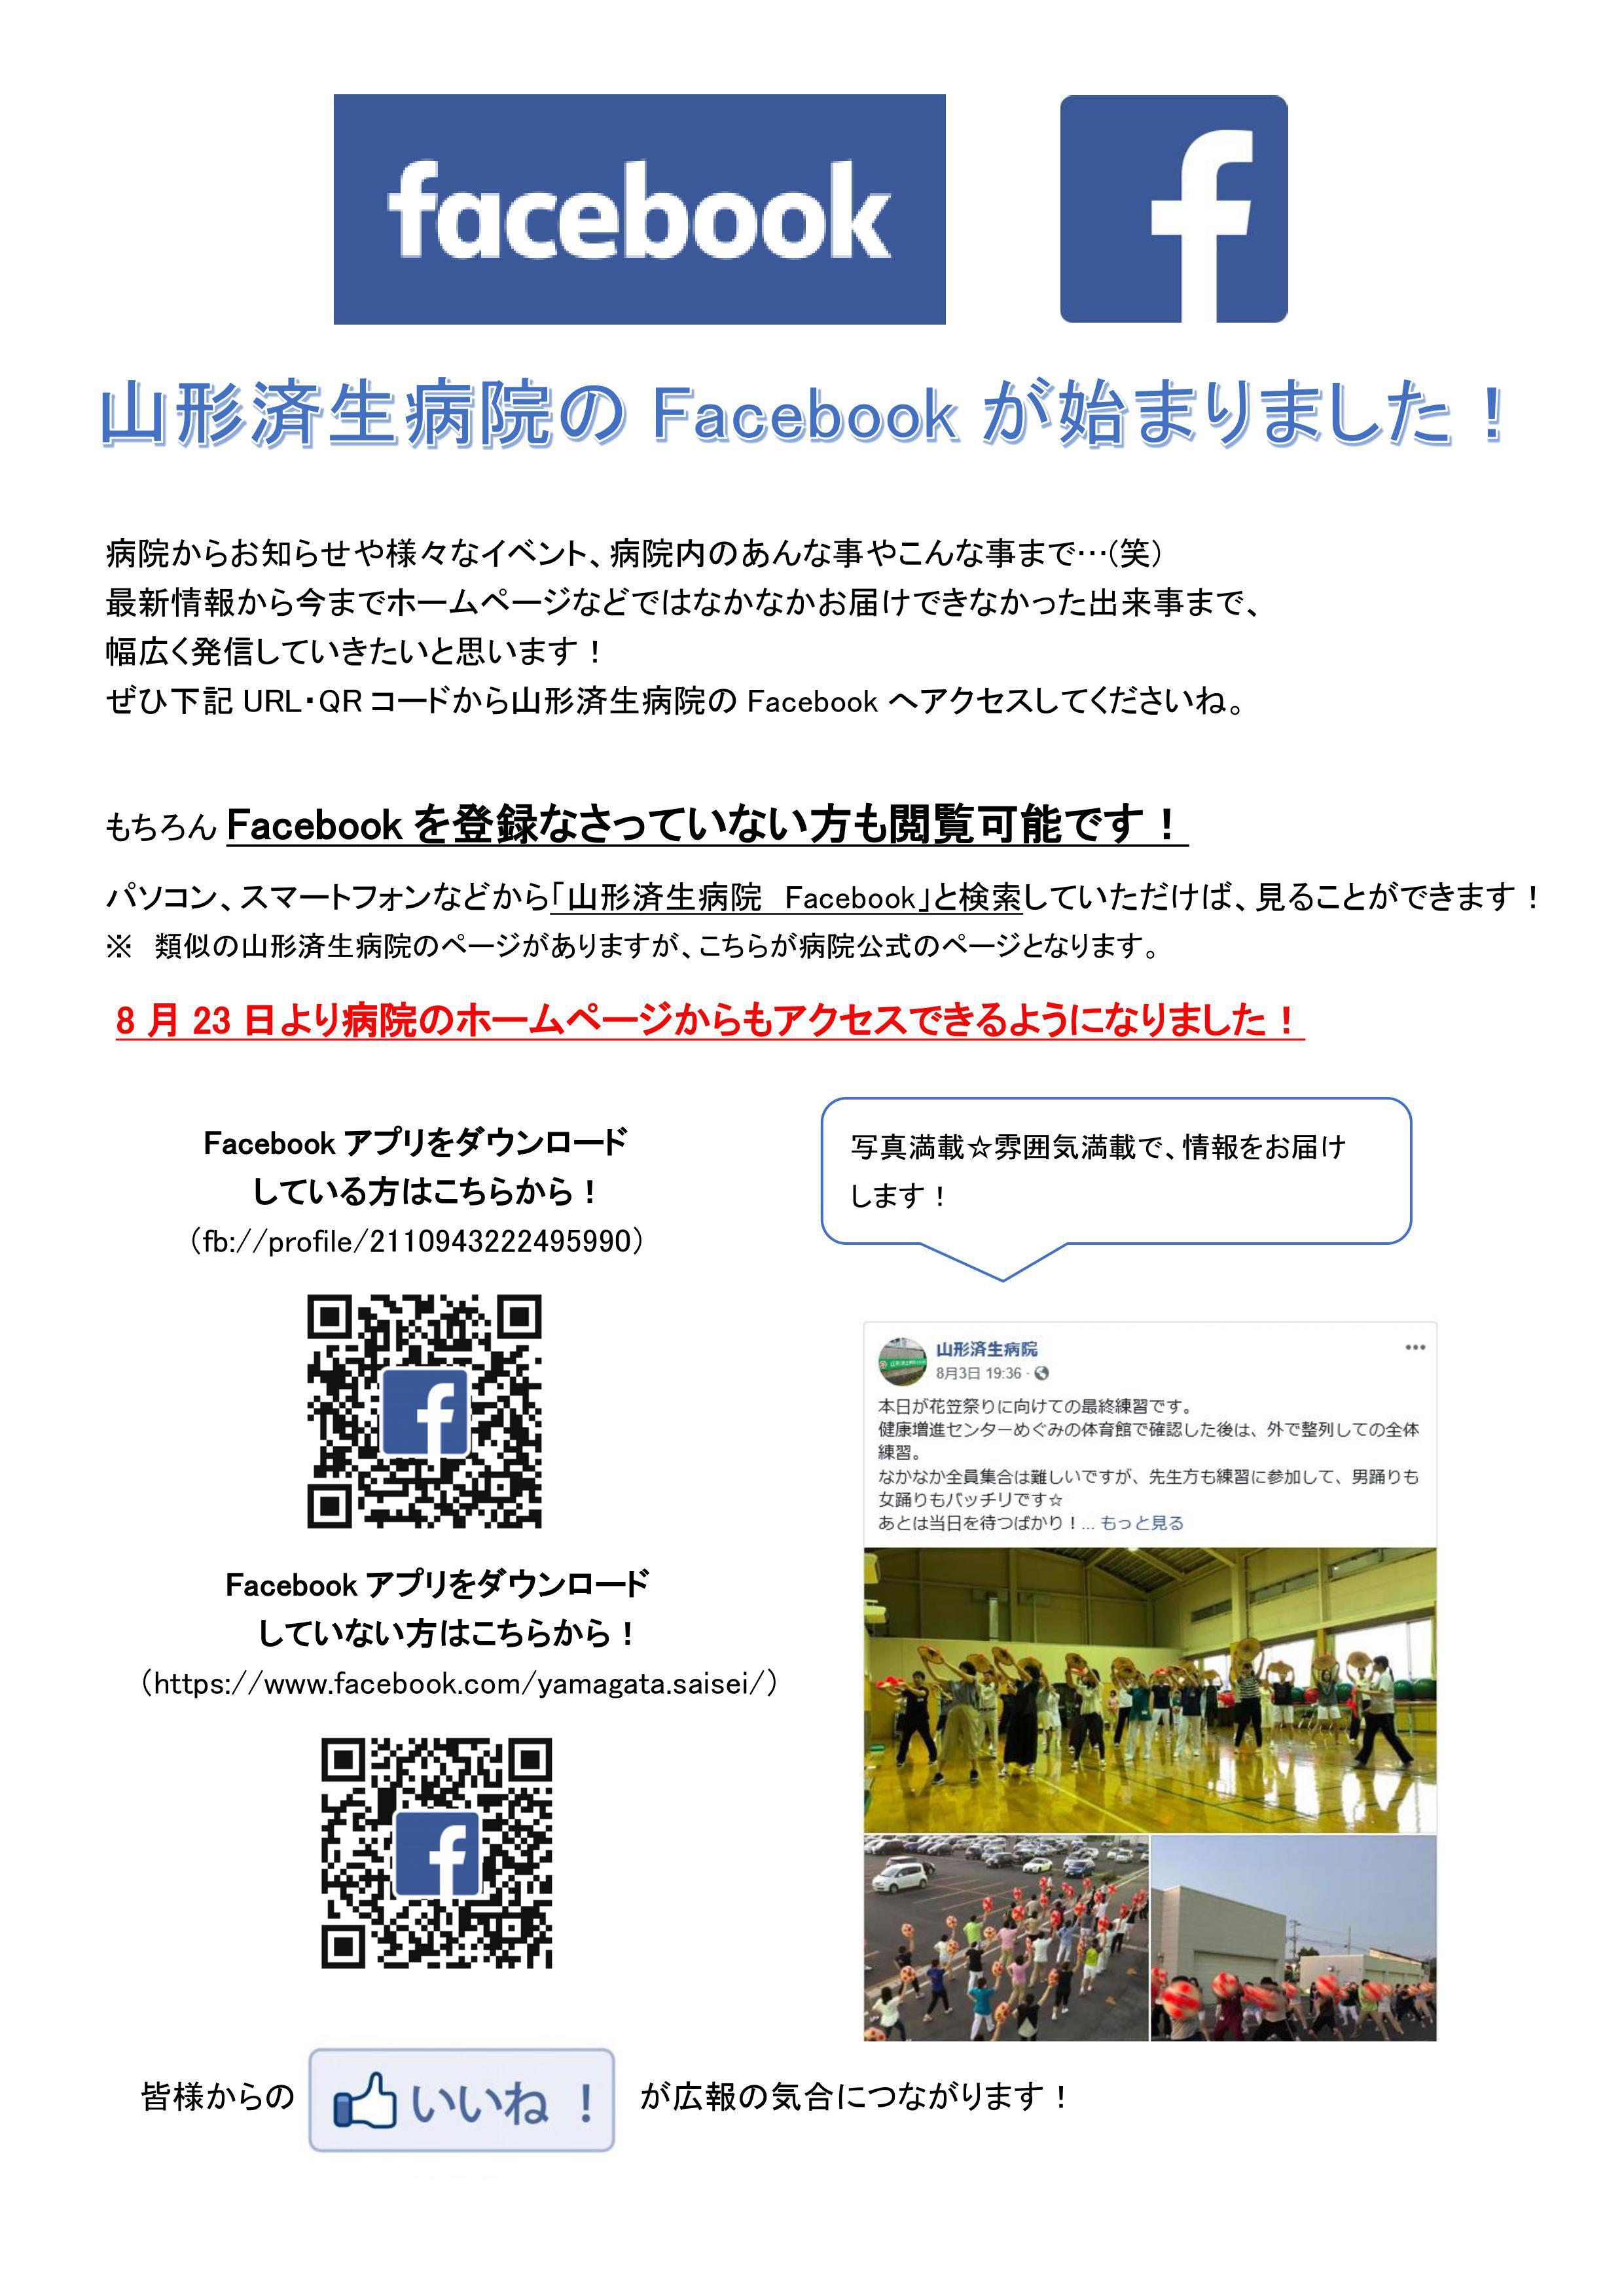 Facebook(院内掲示用)8.24改正.jpg